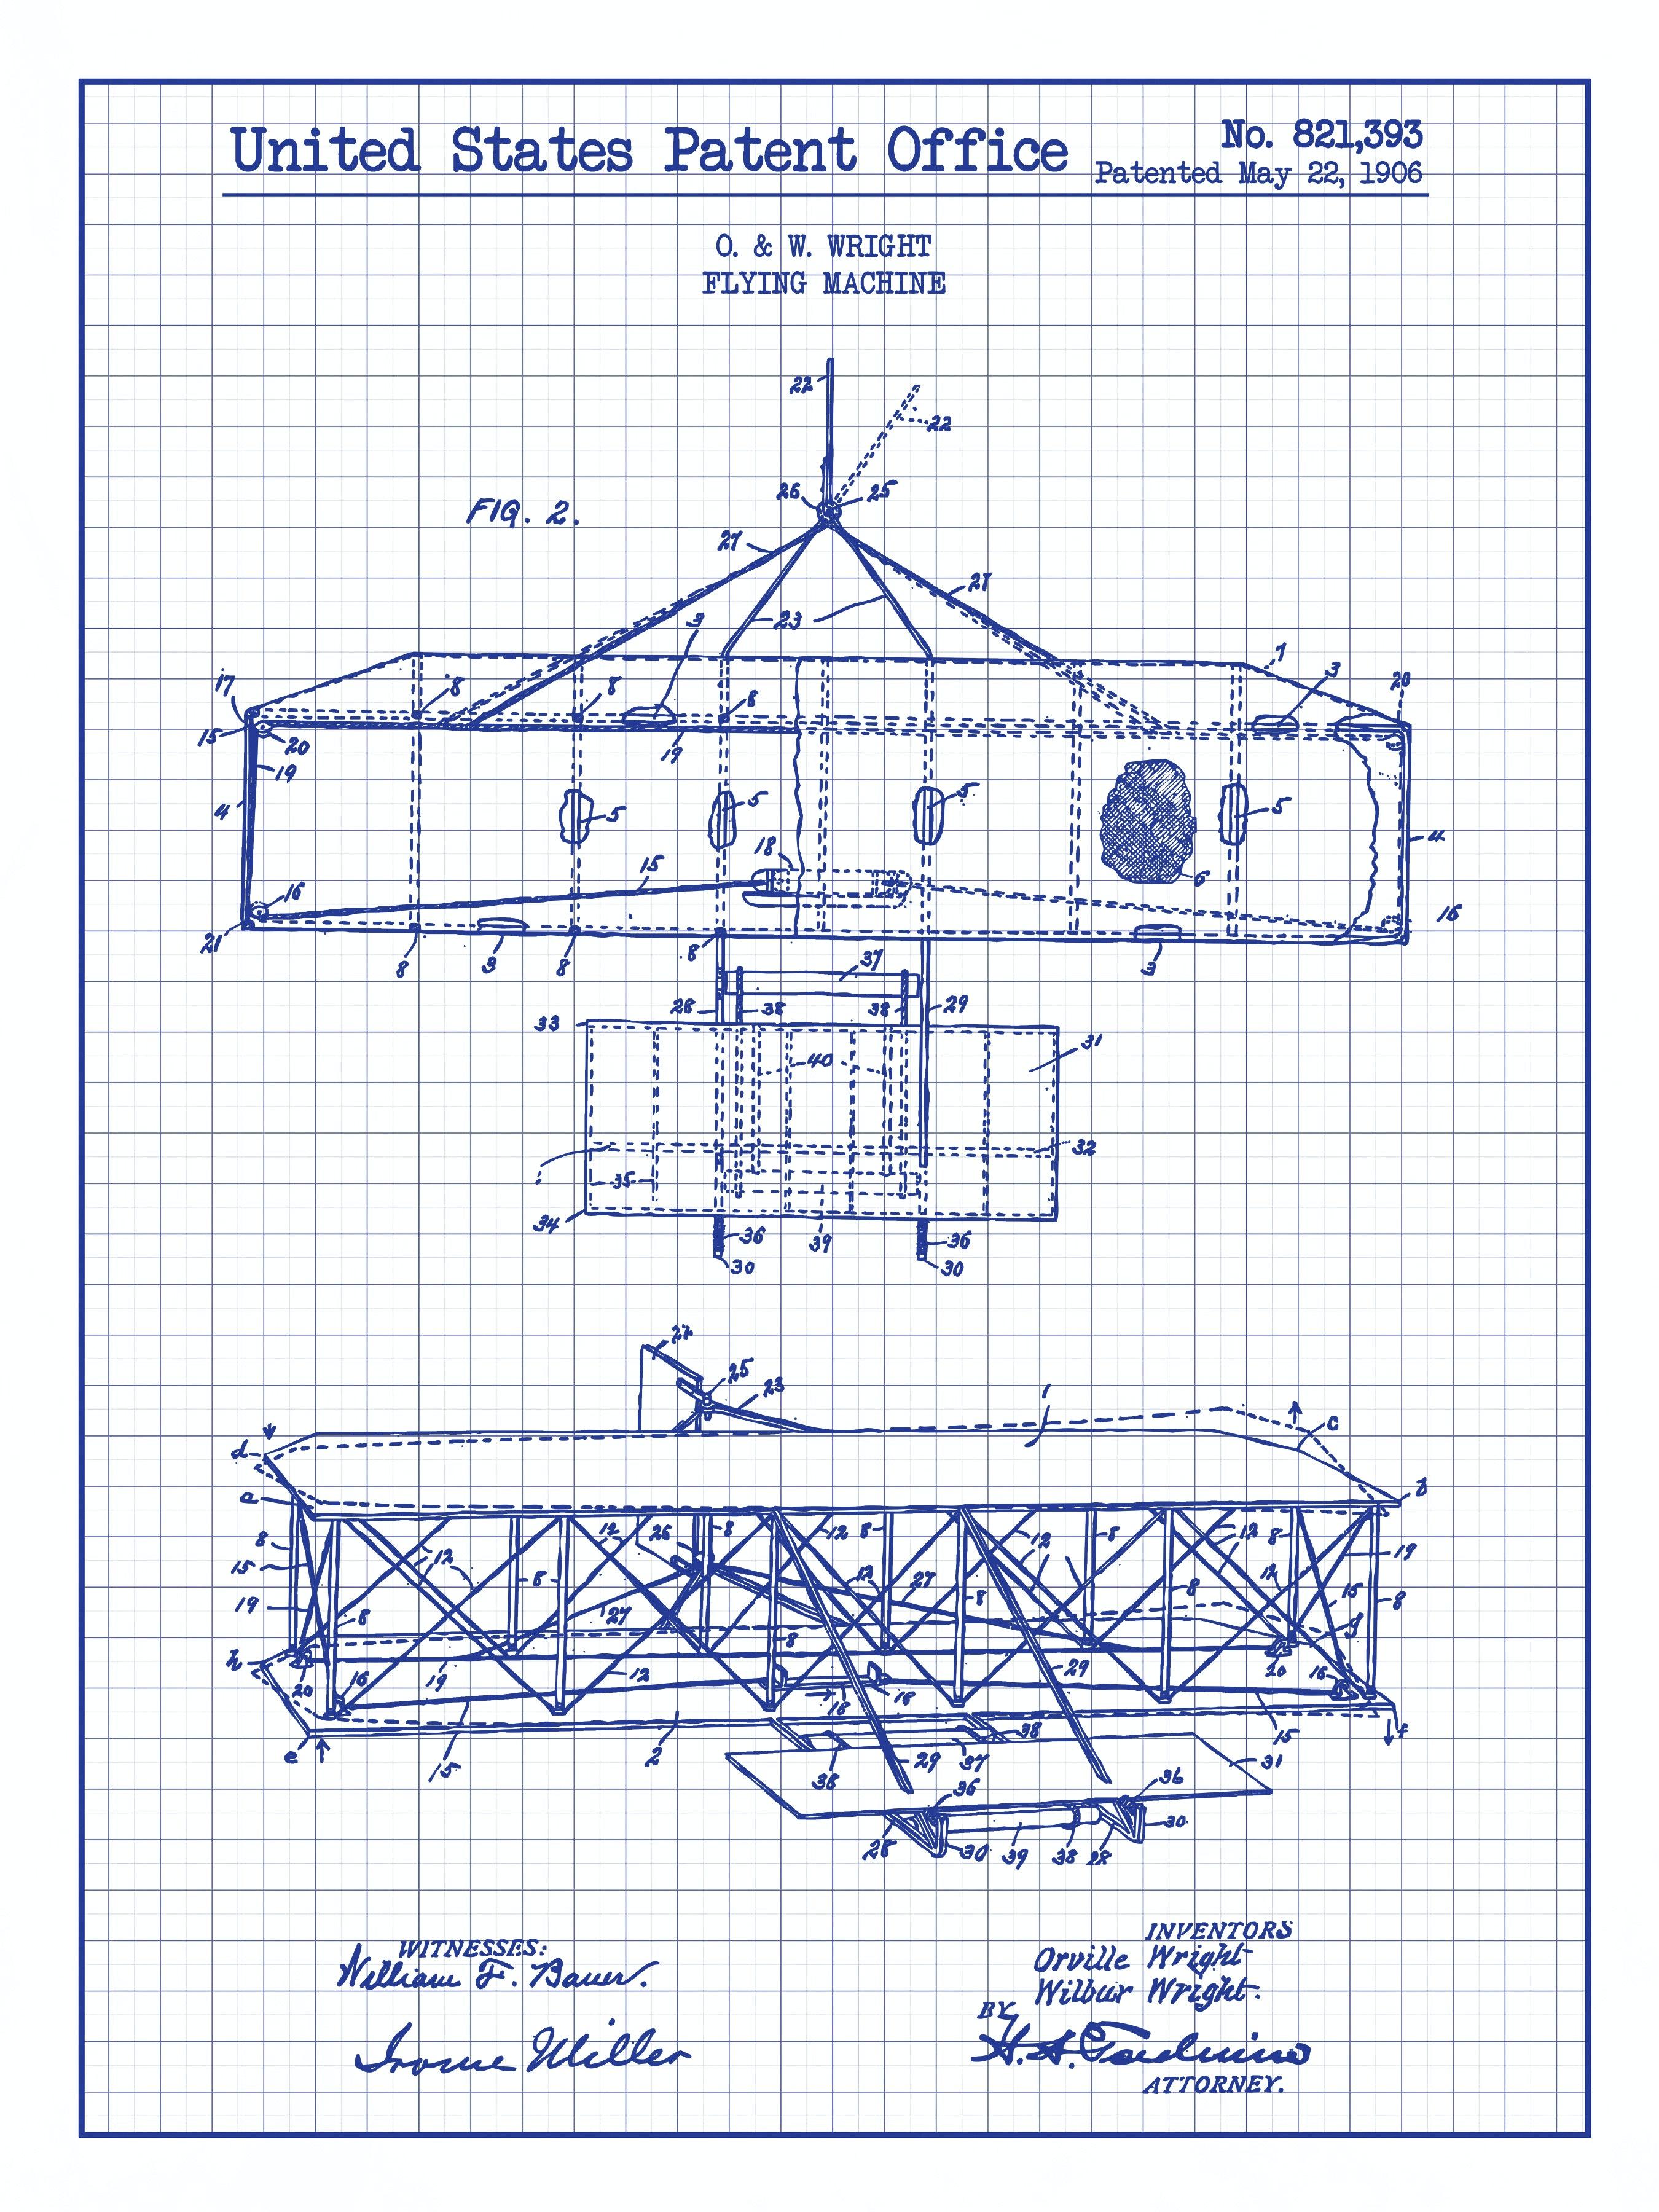 Wright Flying Machine - Wright Bros. - 1906 - 821,393